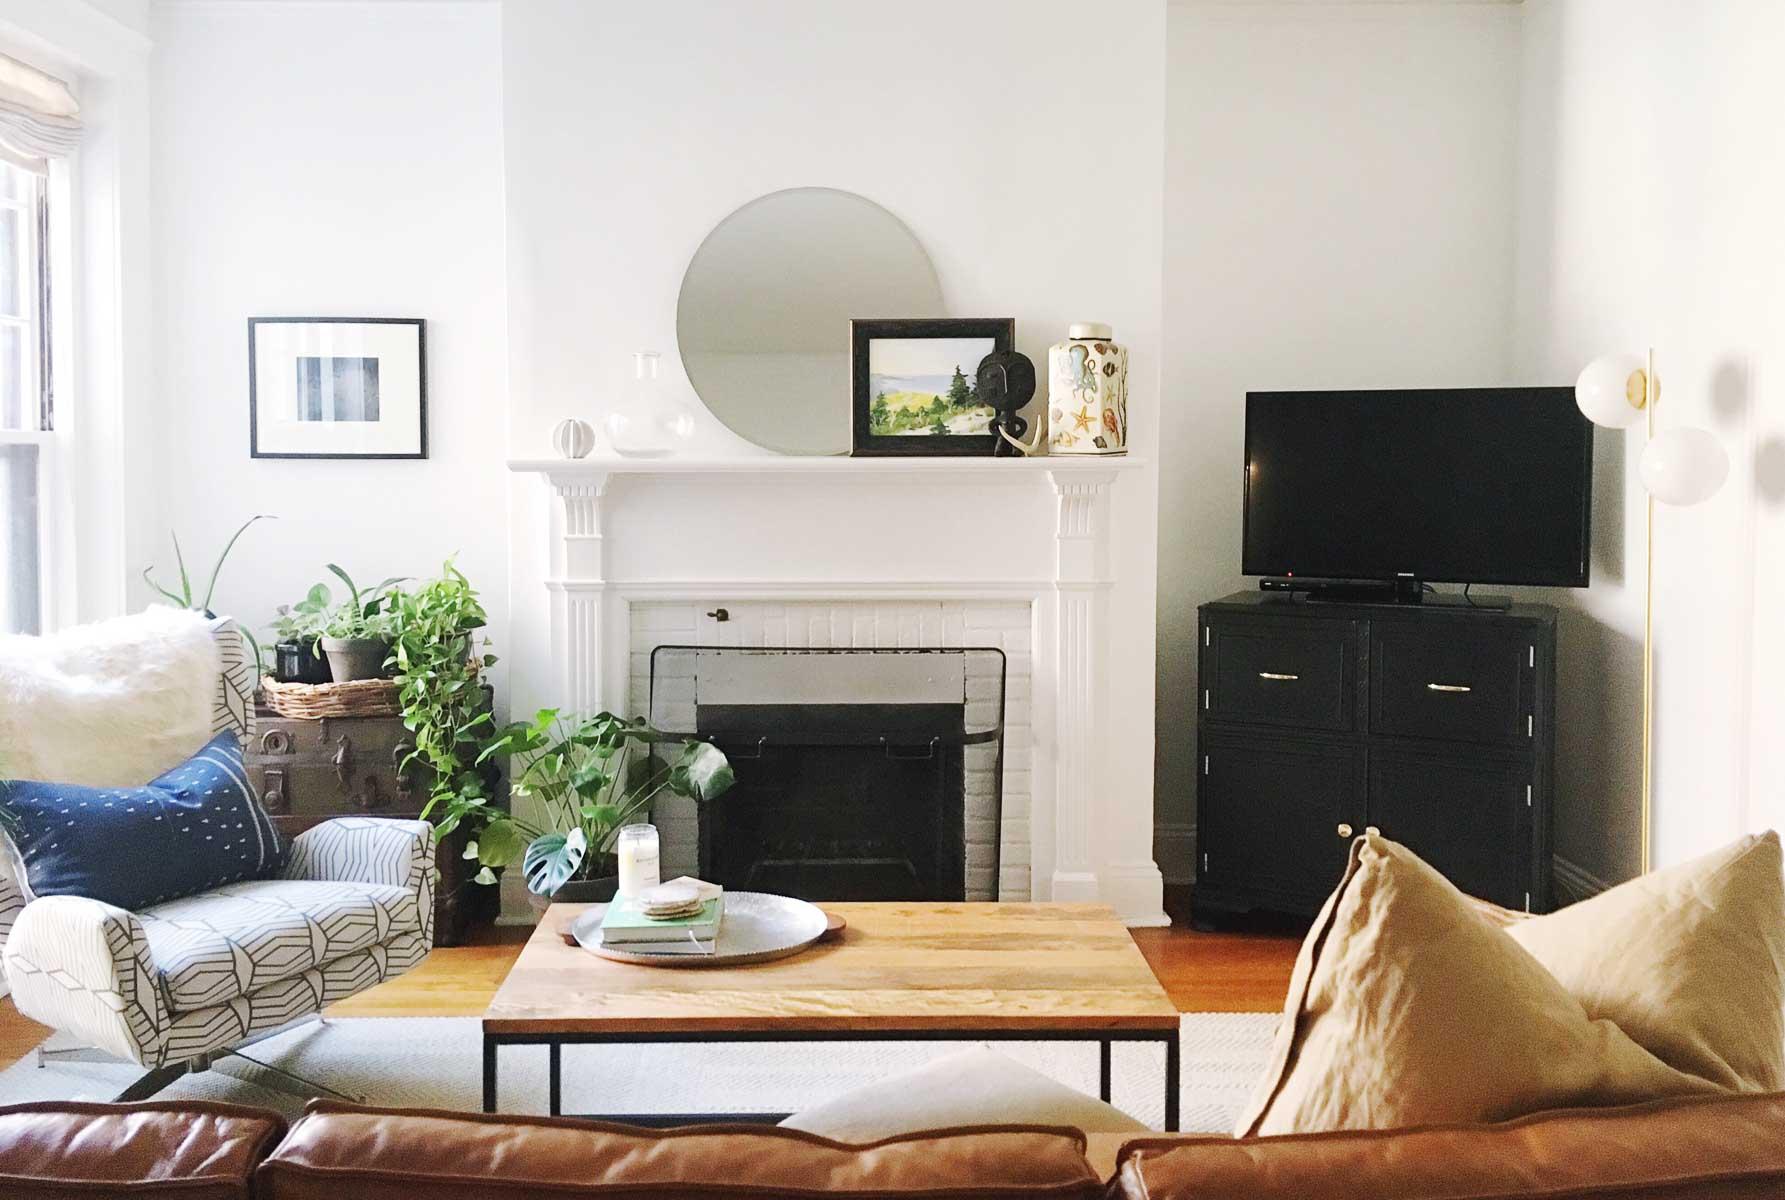 Boho-Charm-michigan-natural-light-photography-studio-lifestyle-photo-ideas-indoor-photoshoot-location-12.jpg